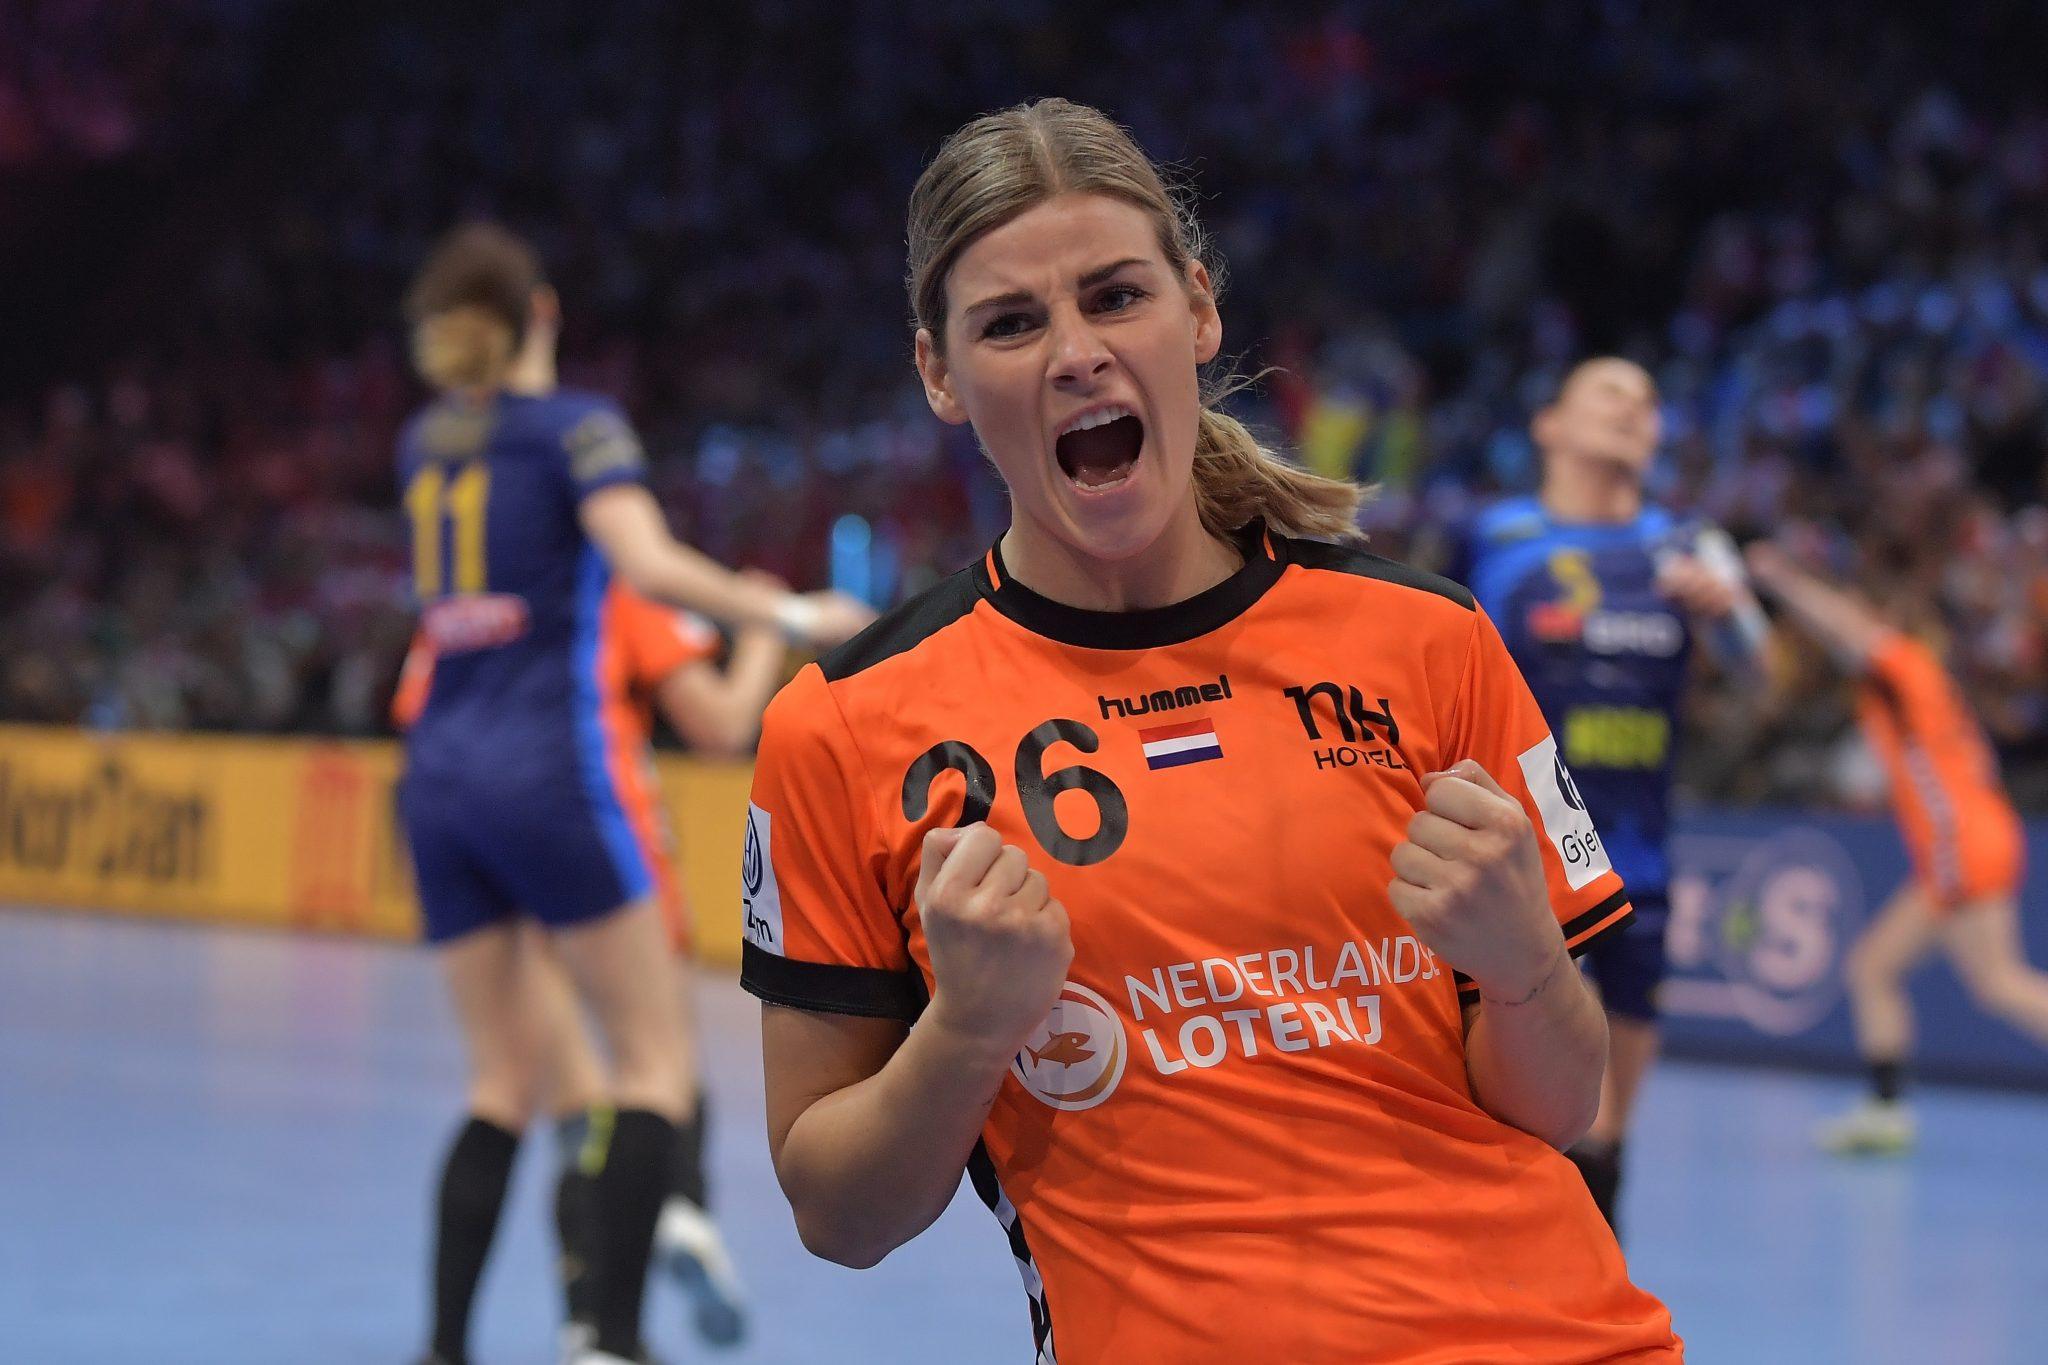 16-12-2018: Handbal: Vrouwen Nederland V Roemenie: Parijs EK Handbal In Frankrijk, 3/4 Plaats Nederland-Roemenie Angela Malestein #26 NED